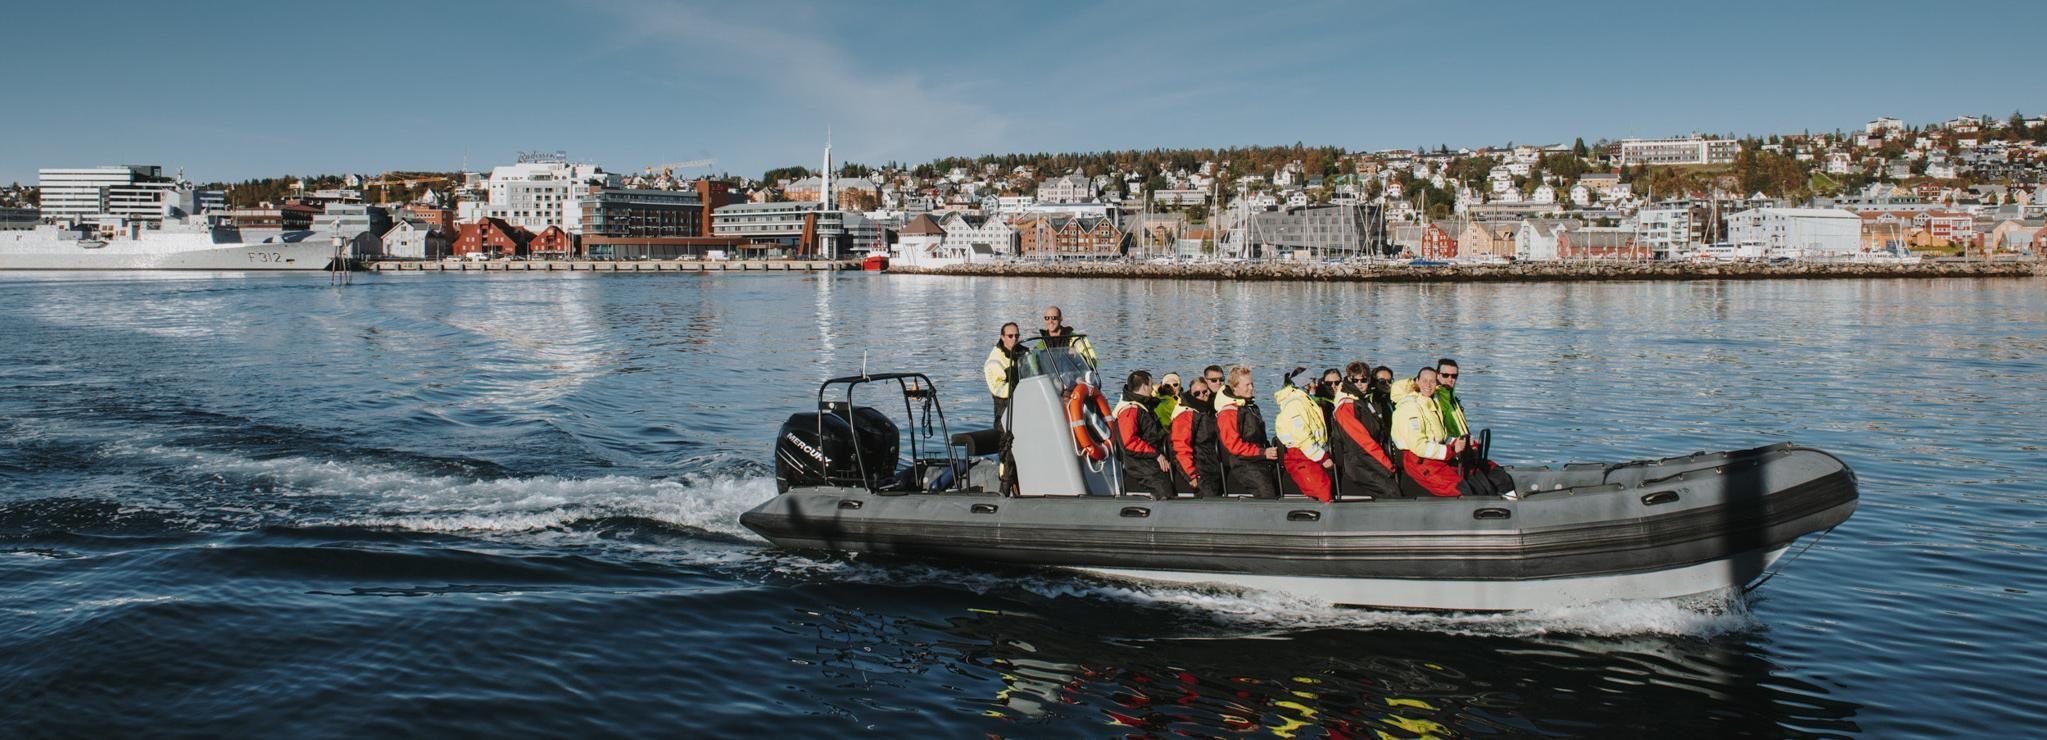 Tromsø: fjordentocht per opblaasboot met vormvaste bodem